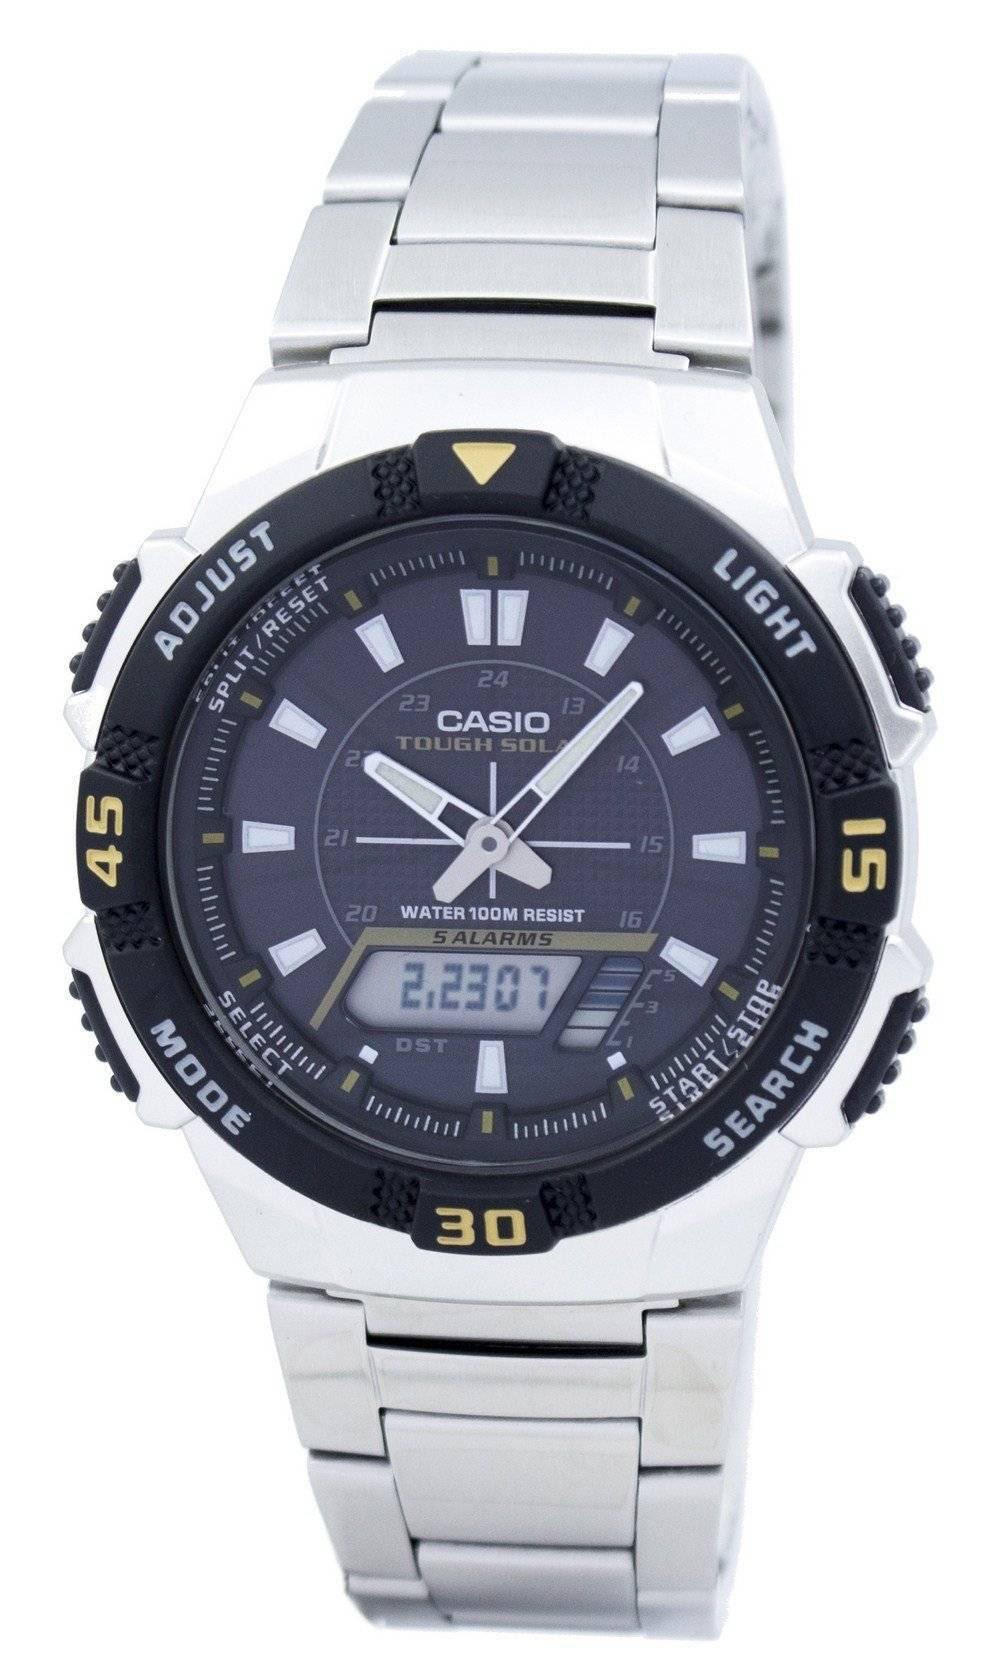 b998e0bd3c96 Reloj de hombre Casio analógico digital resistente solar AQ-S800WD-1EVDF AQ -S800WD-1EV